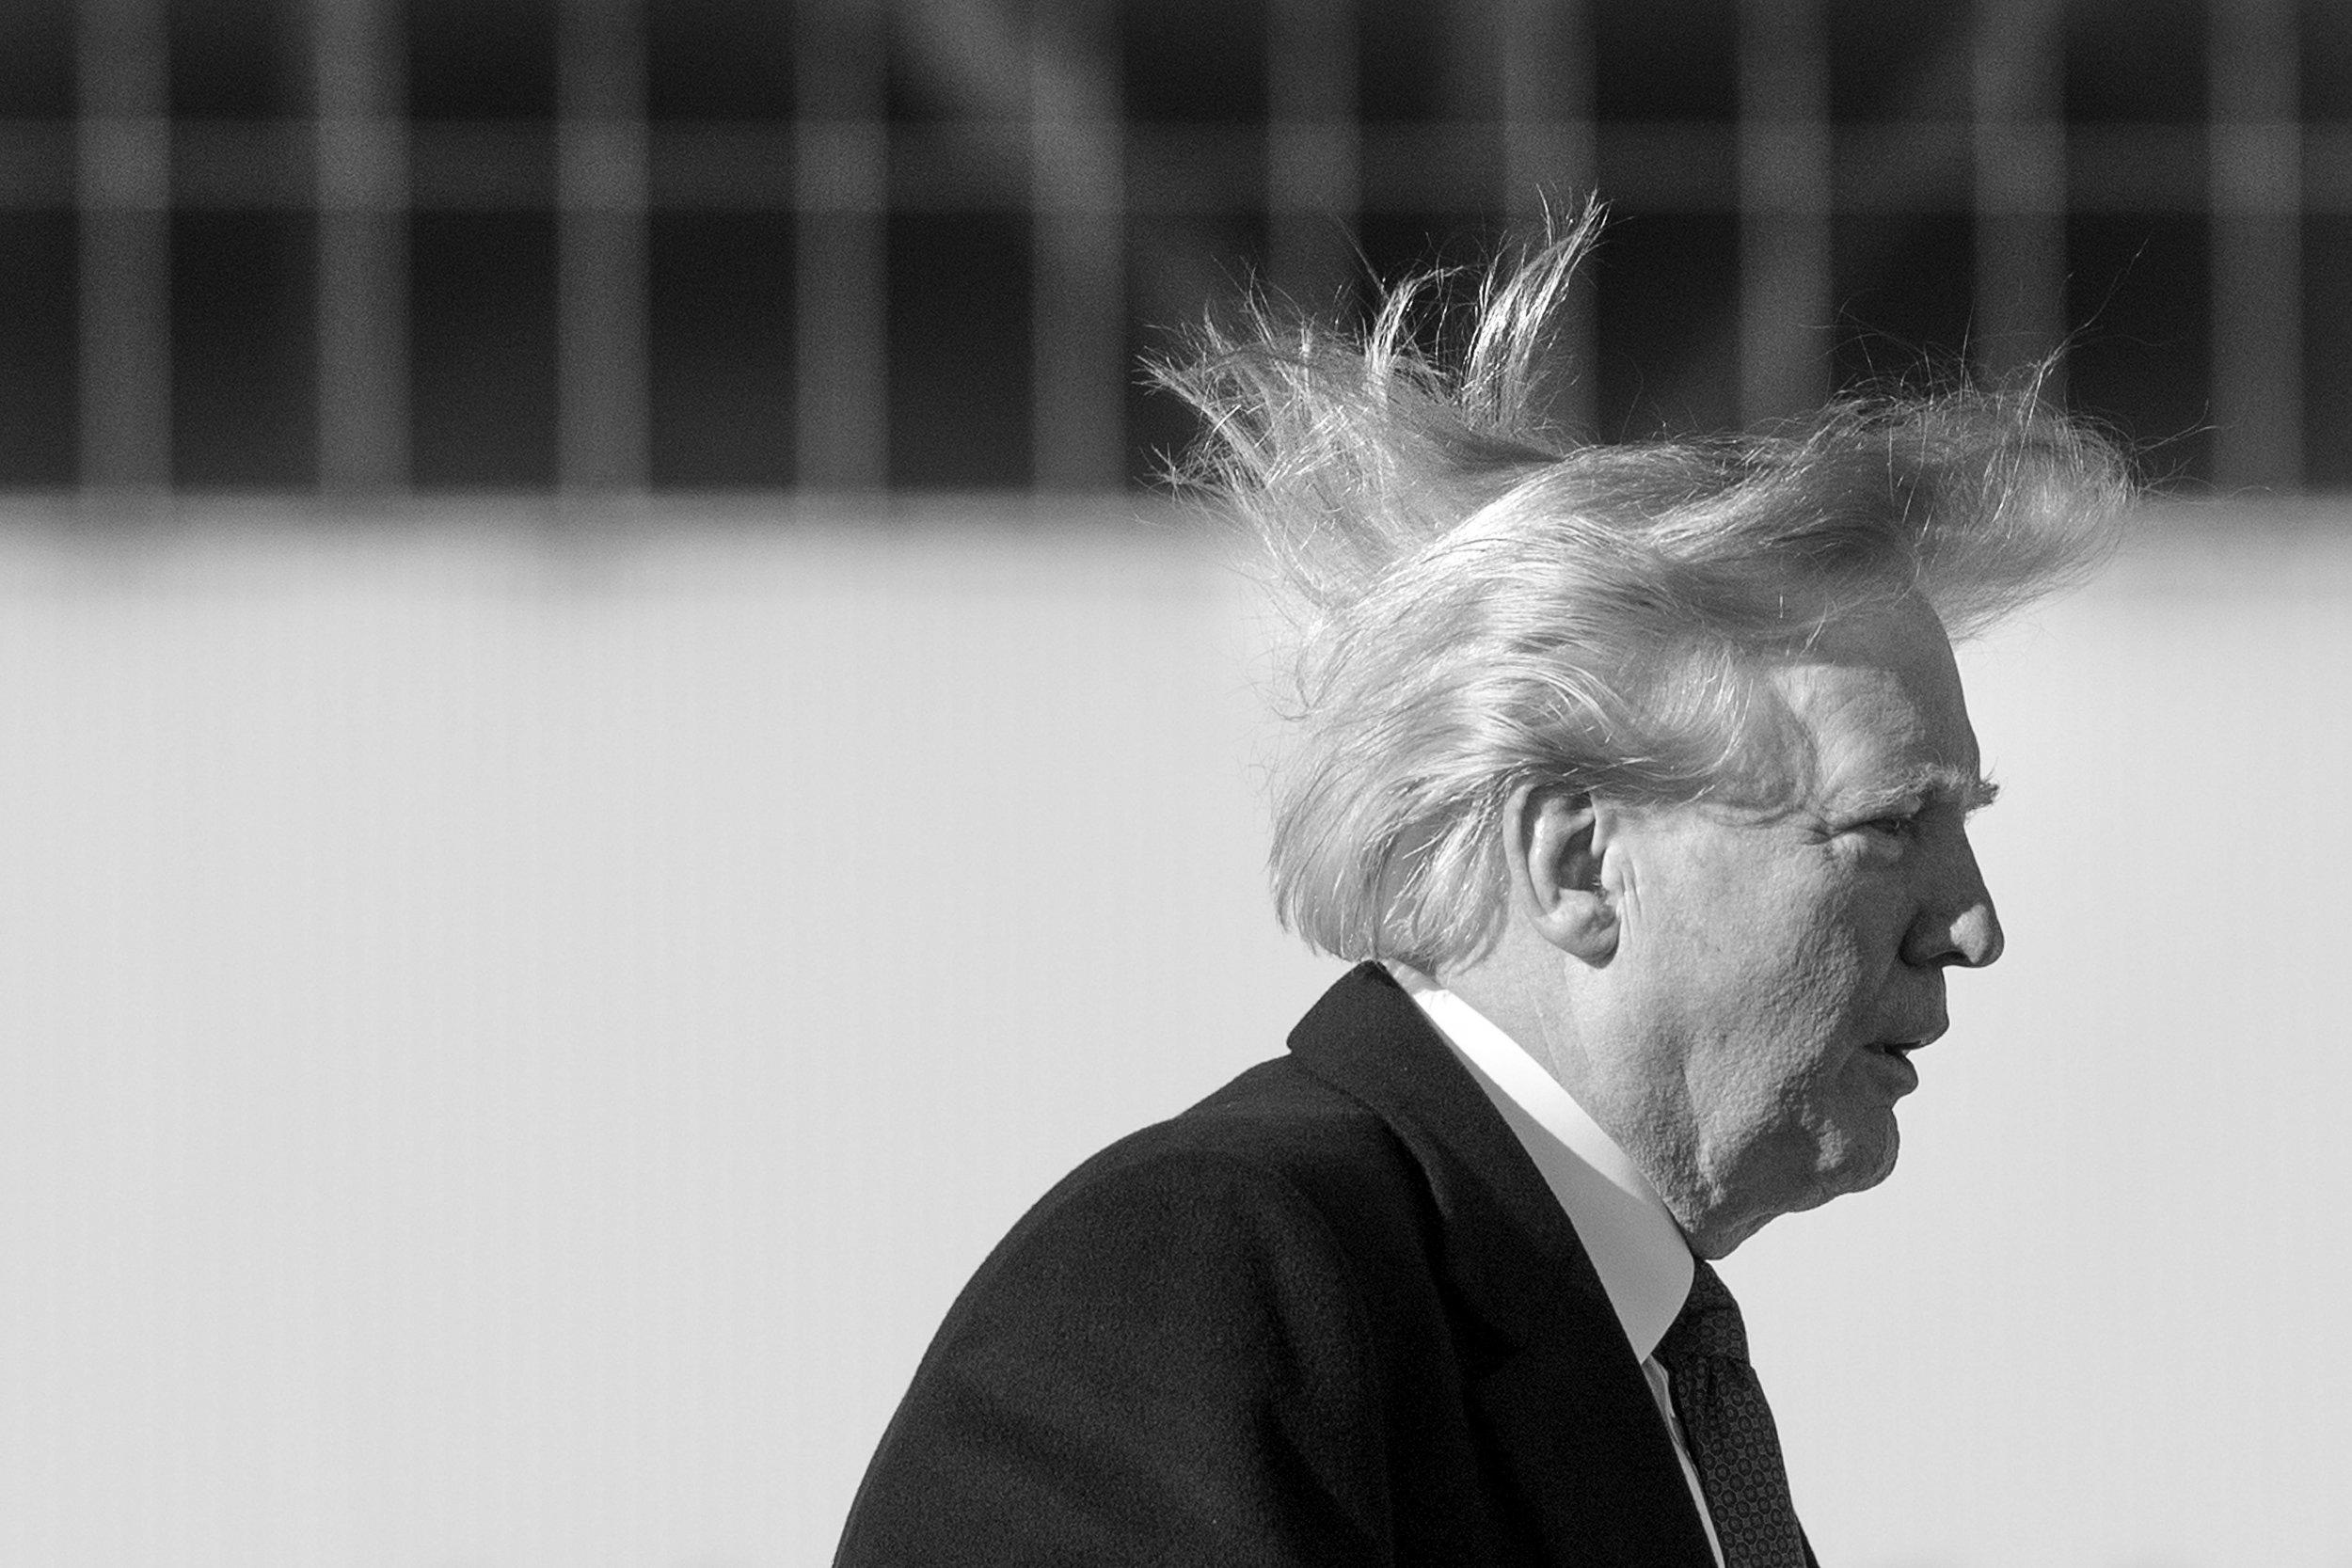 Donald Trump's hair secrets exposed